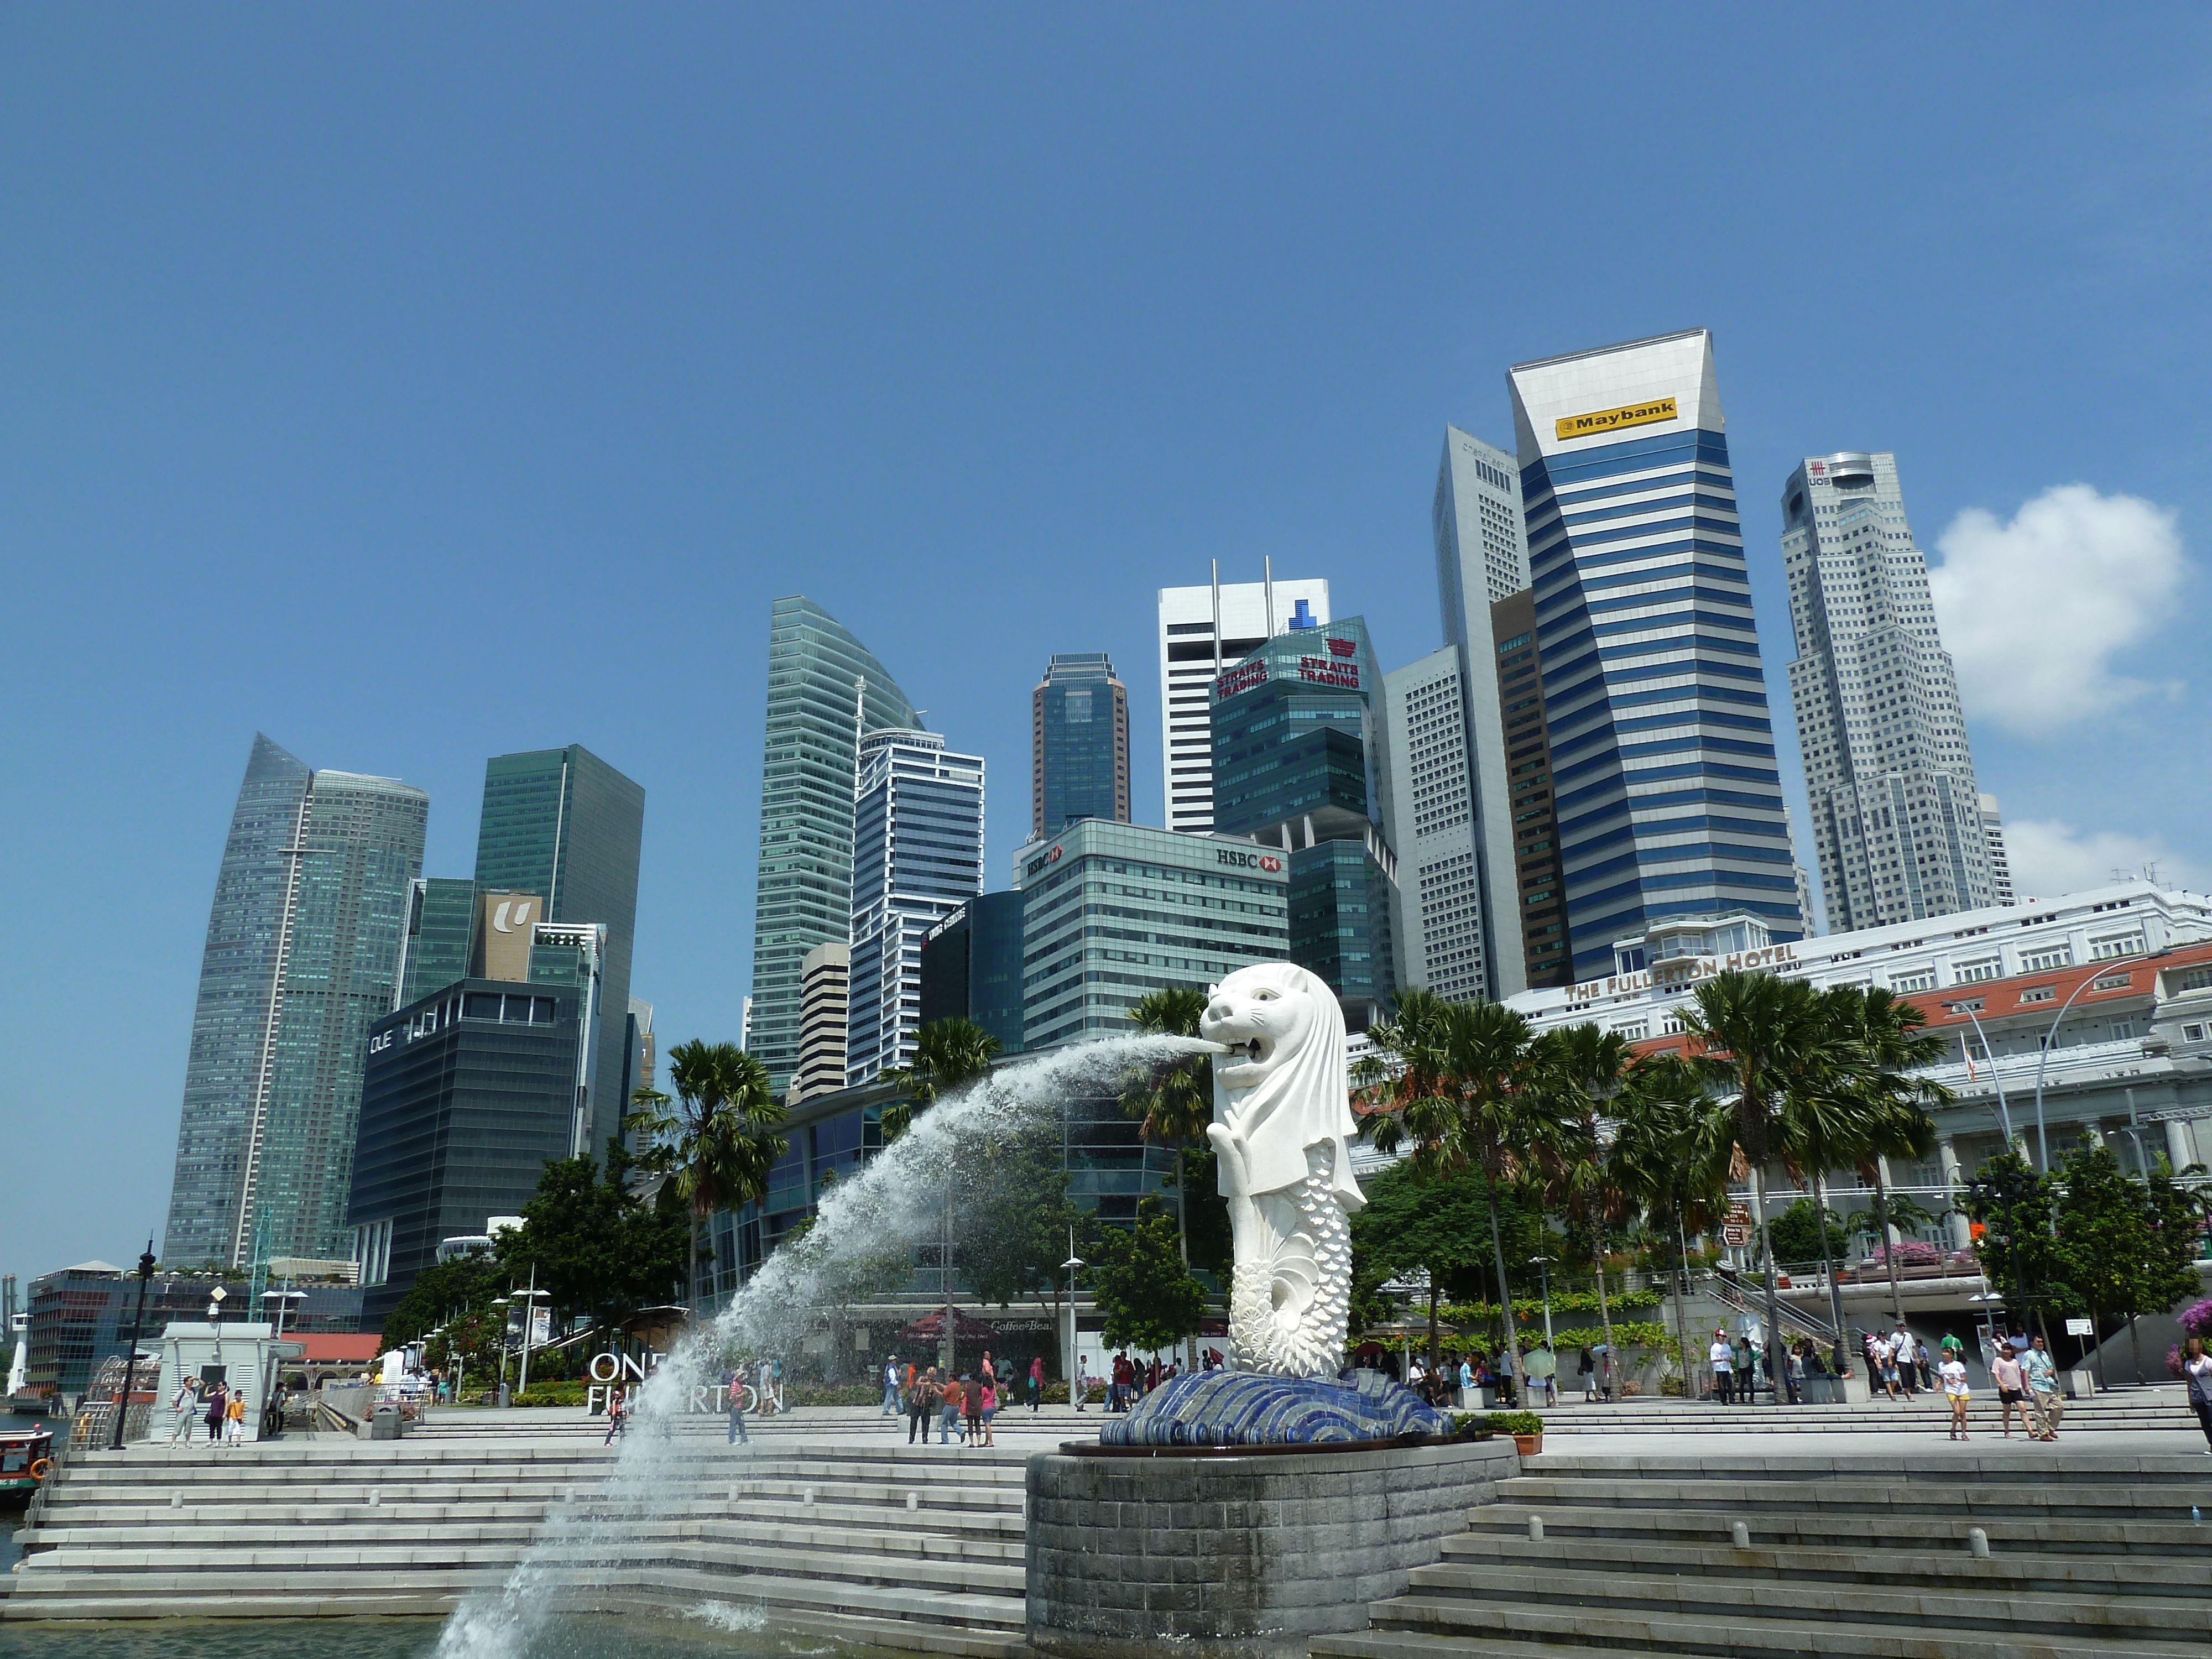 Merlion statue, Merlion Park, Singapore - 20110723.jpg